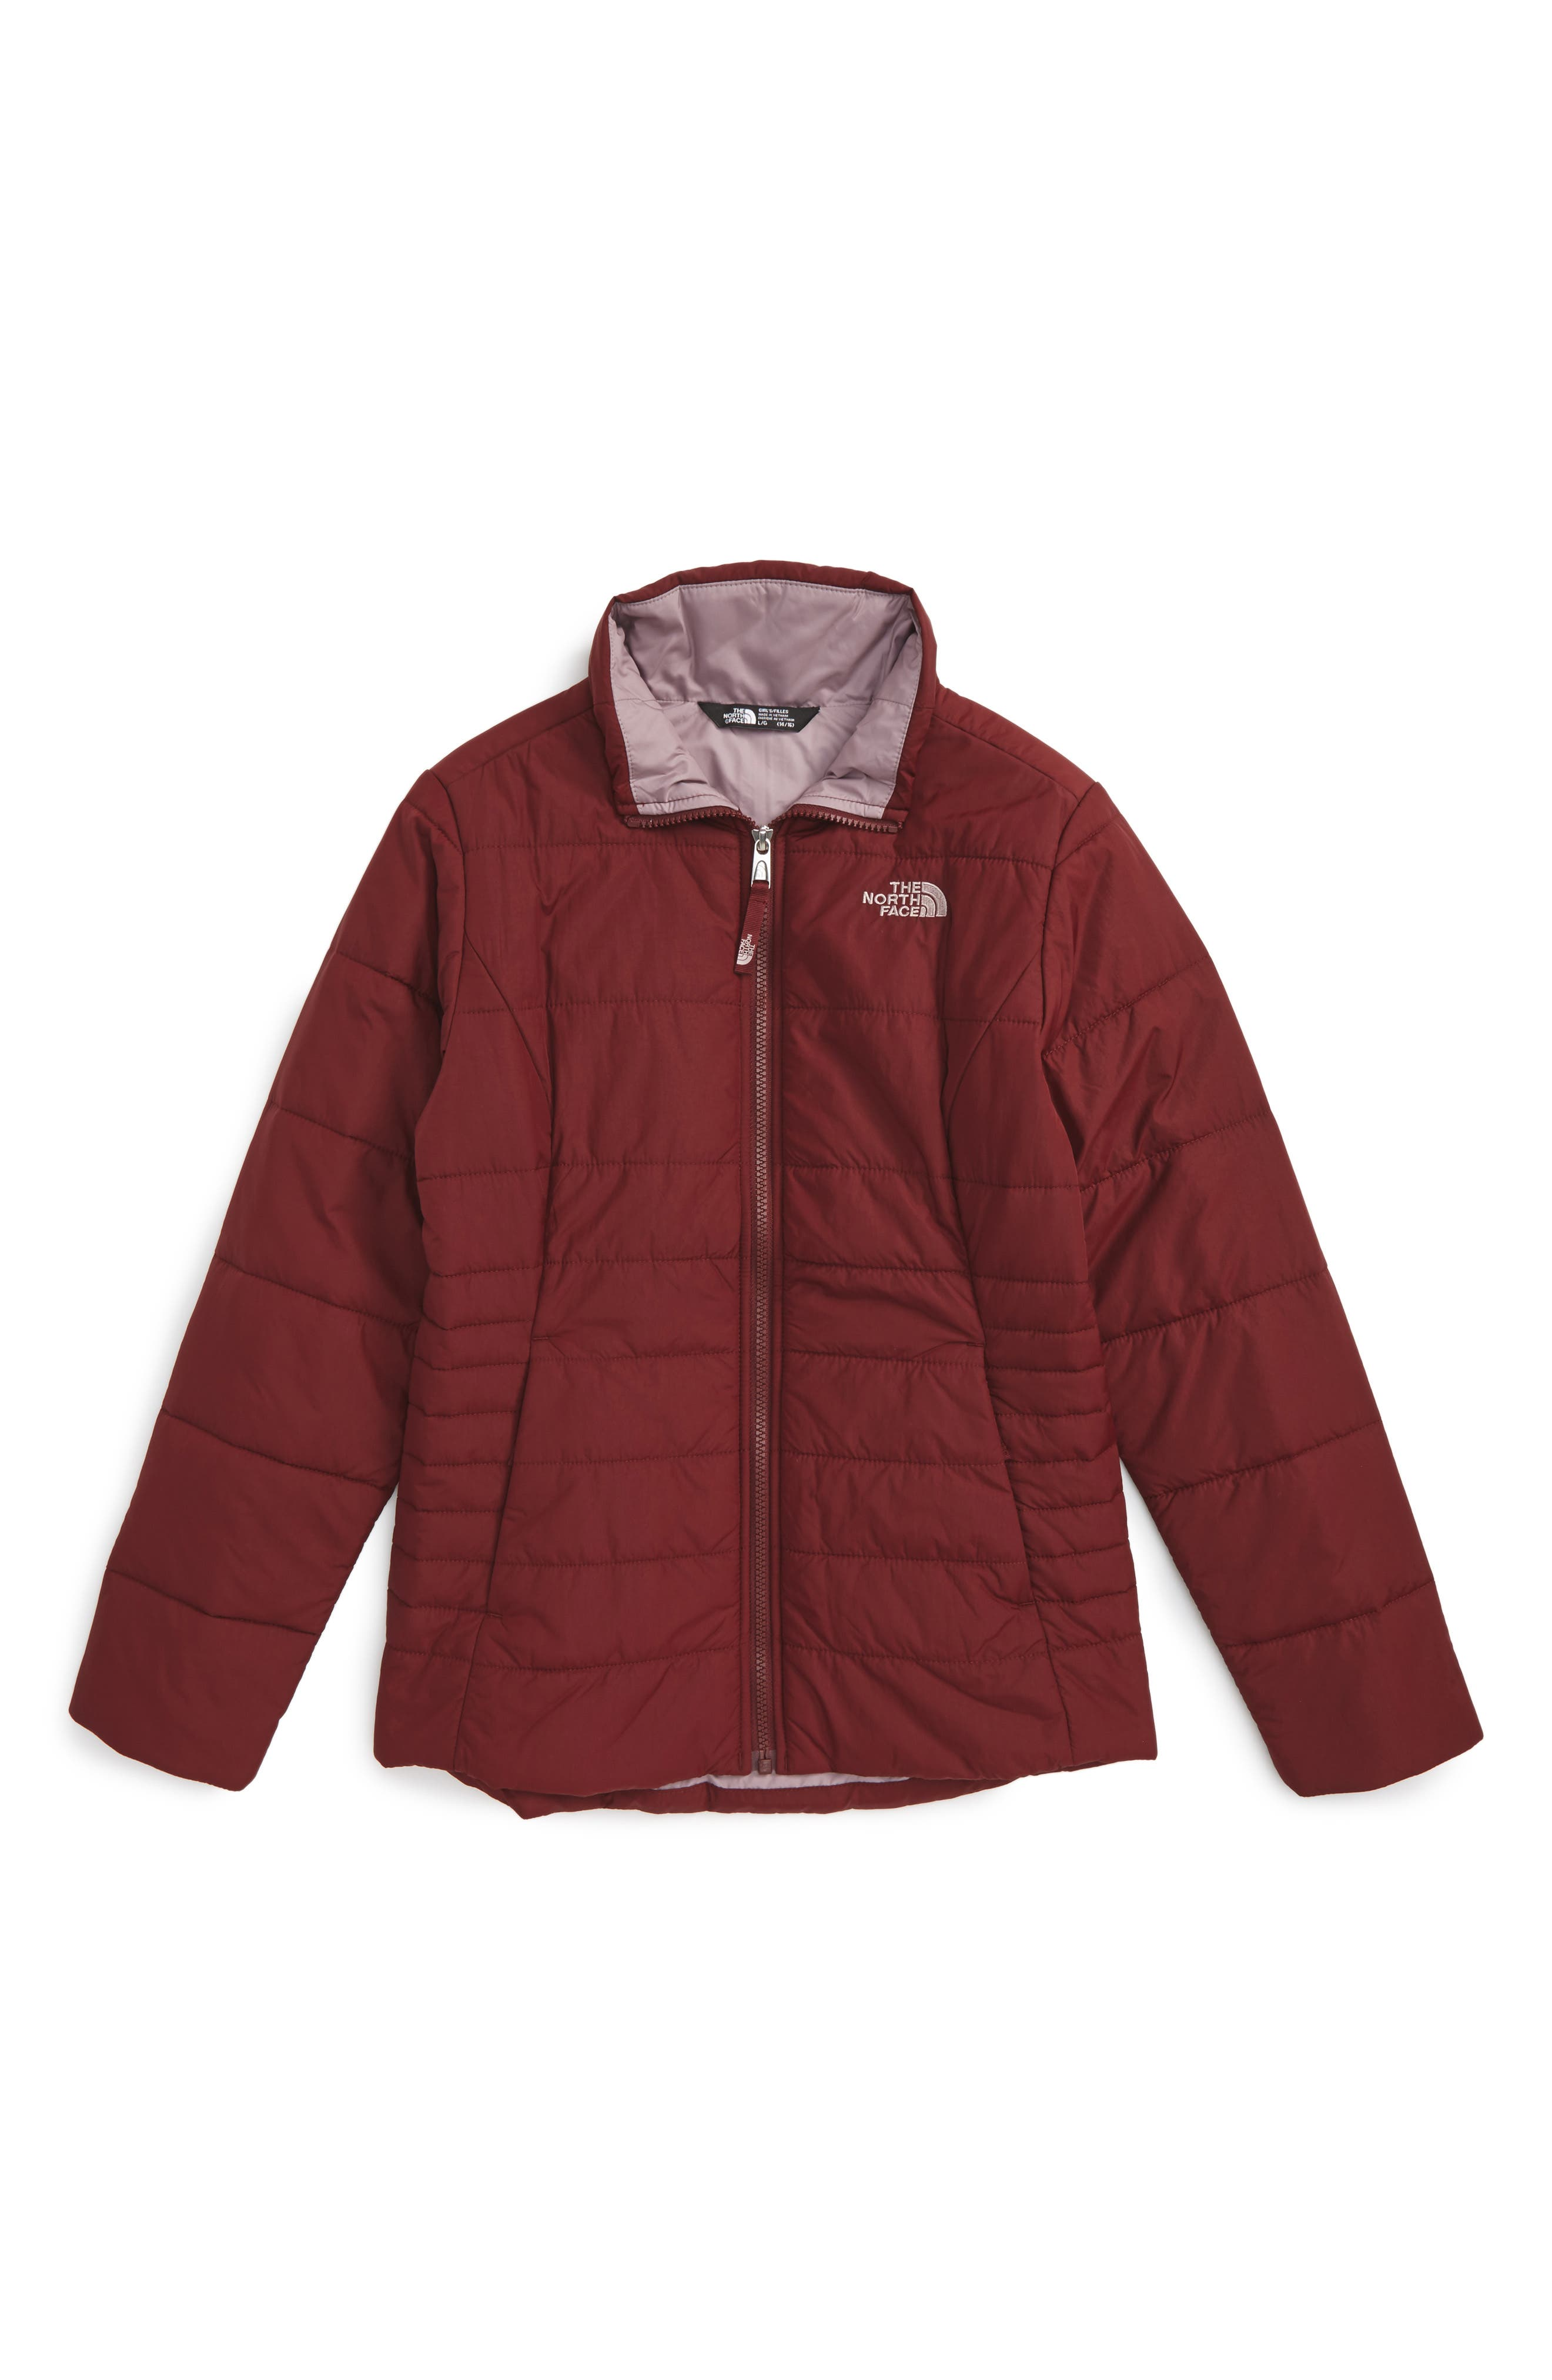 Alternate Image 1 Selected - The North Face Harway Heatseeker™Water-Resistant Jacket (Little Girls & Big Girls)